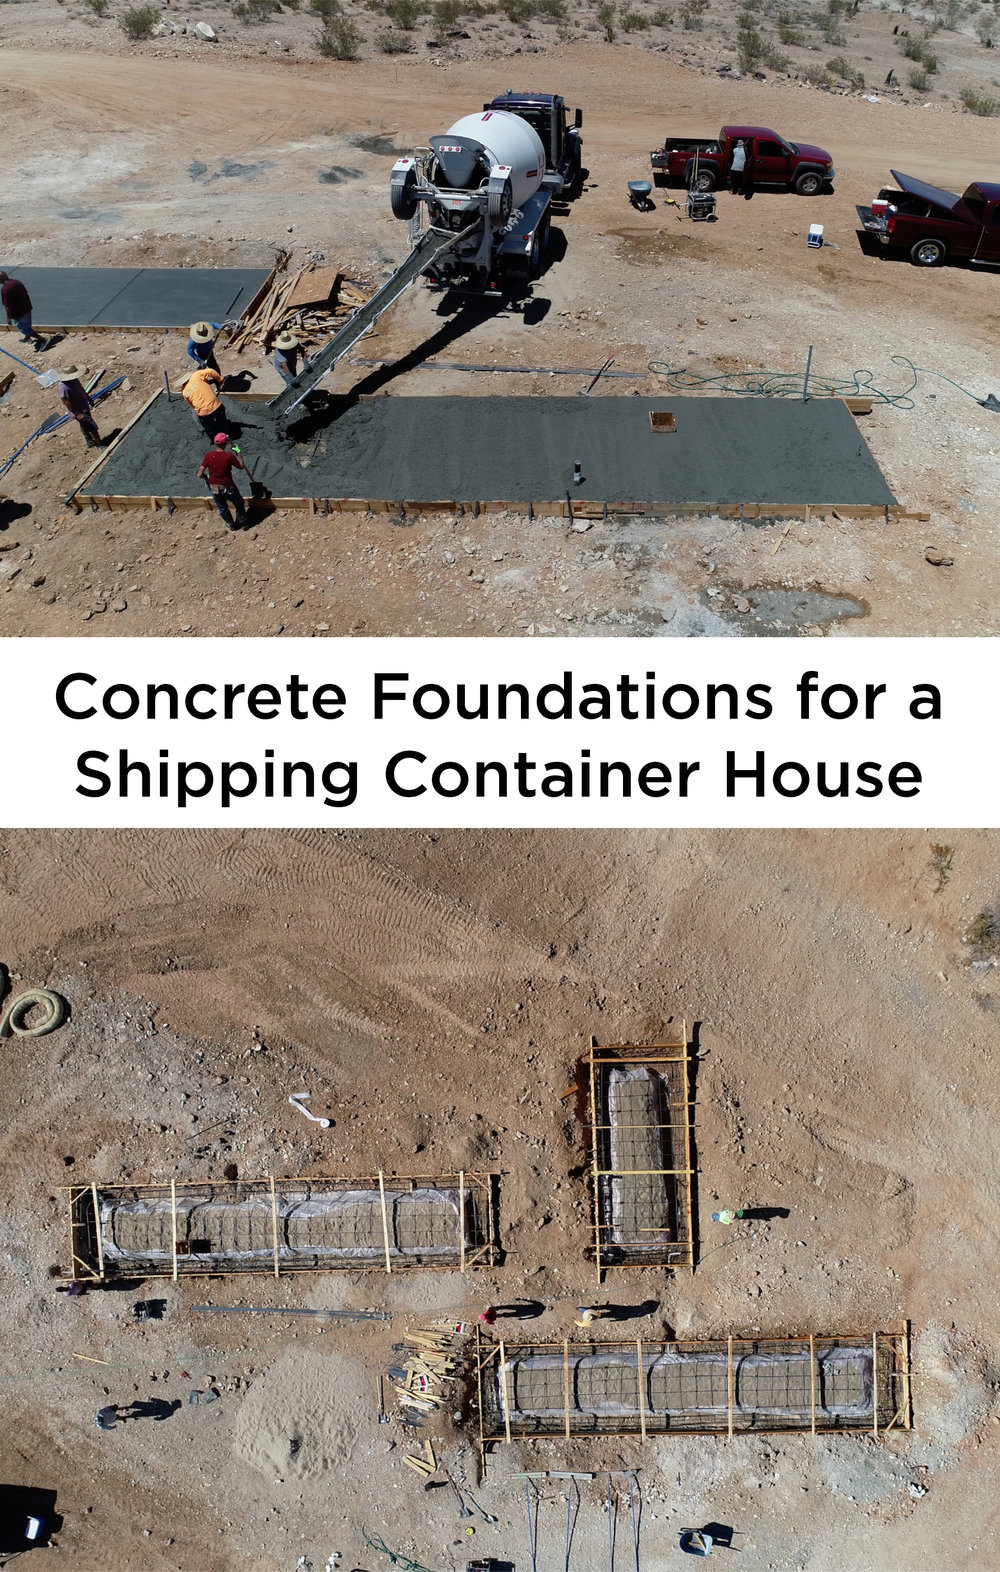 ConcreteFoundations.jpg